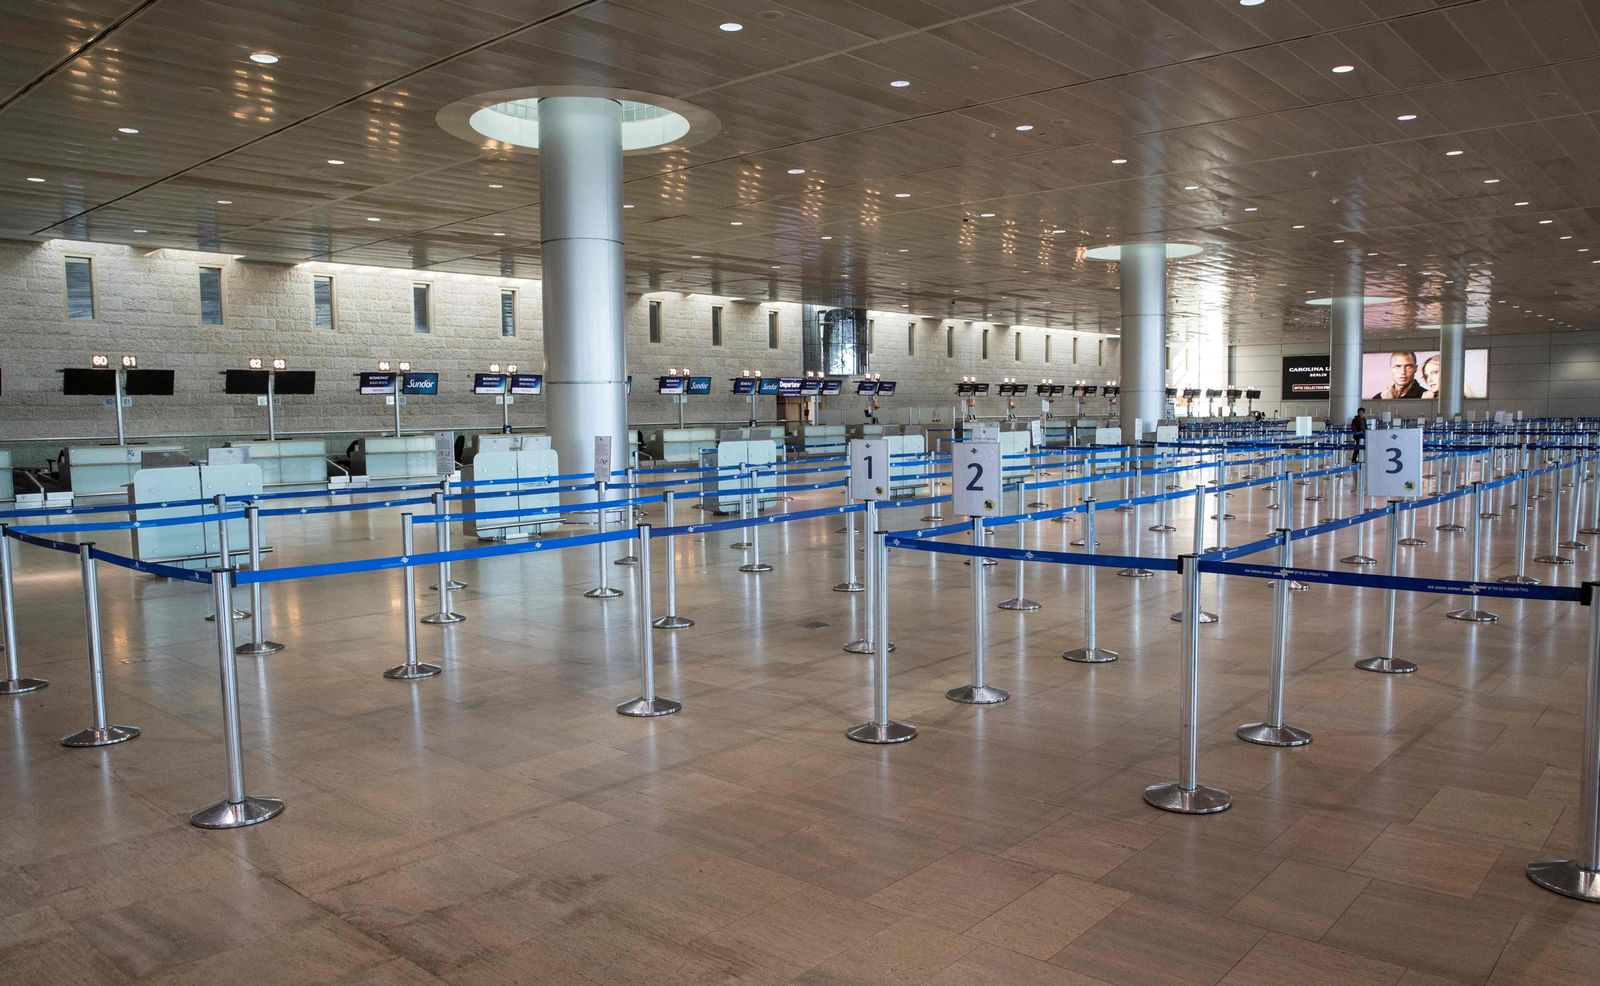 Teva/ Israel/ Streik/ Flughafen